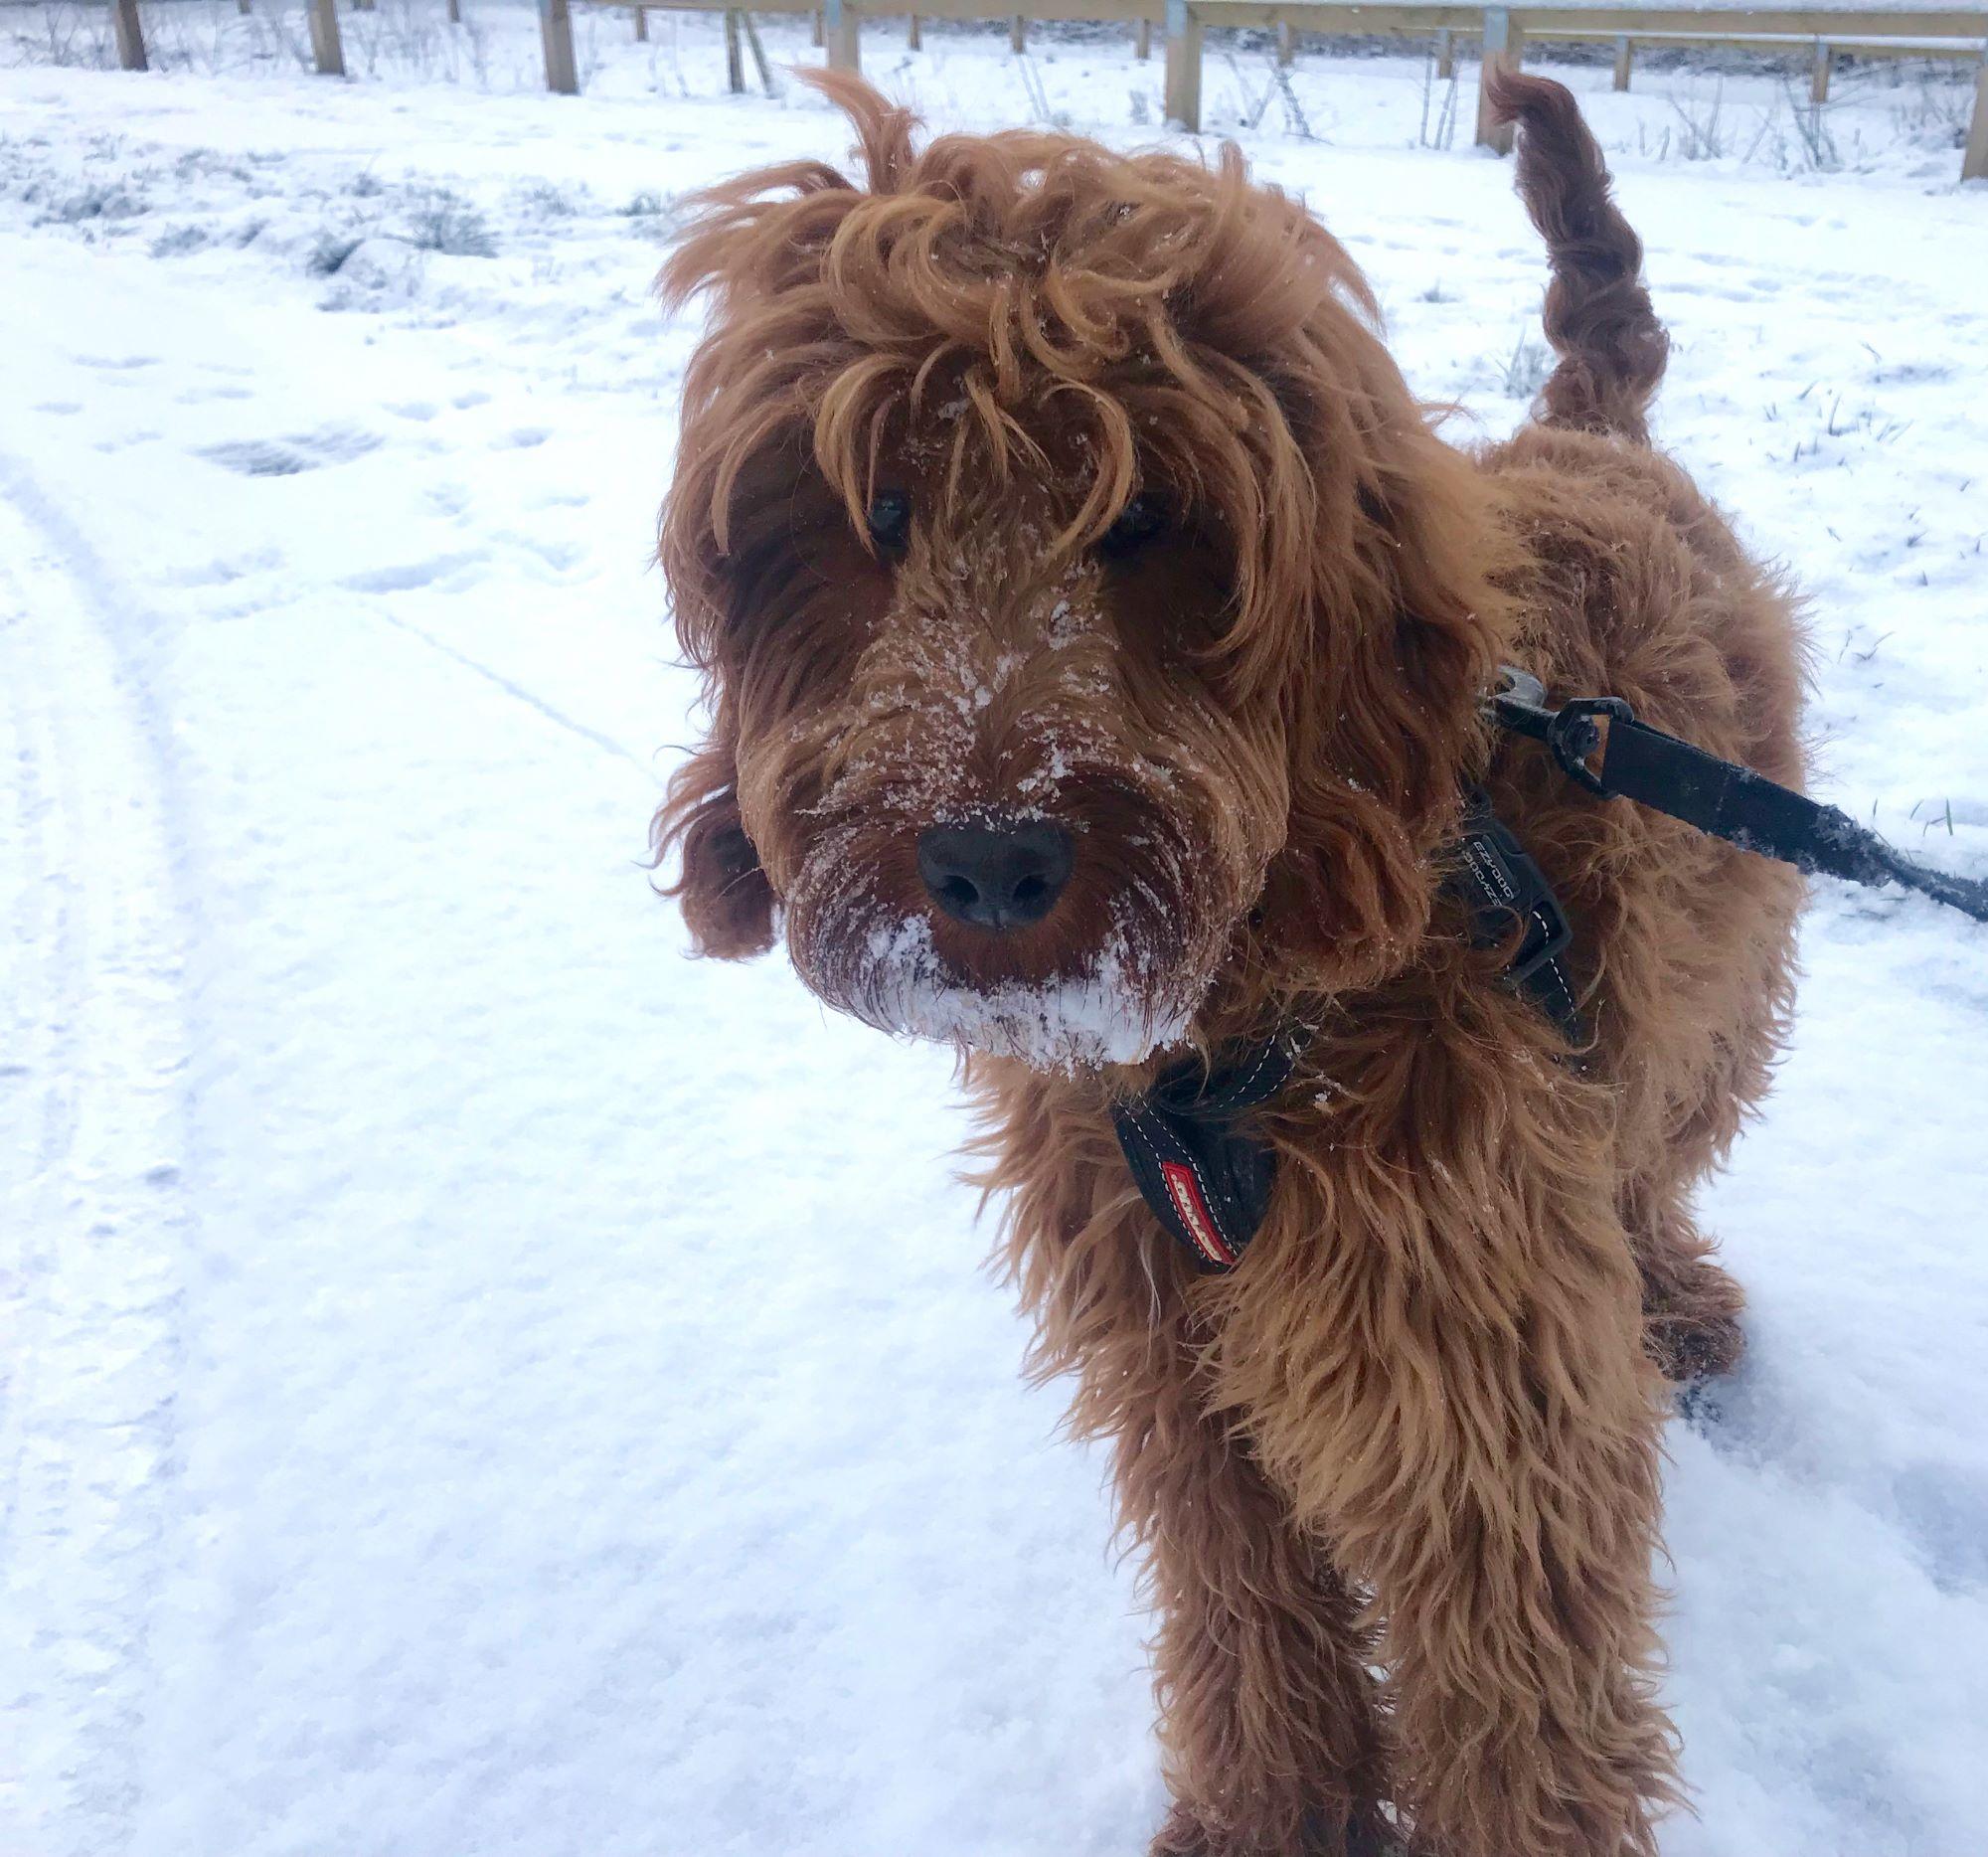 Snowy Wilson